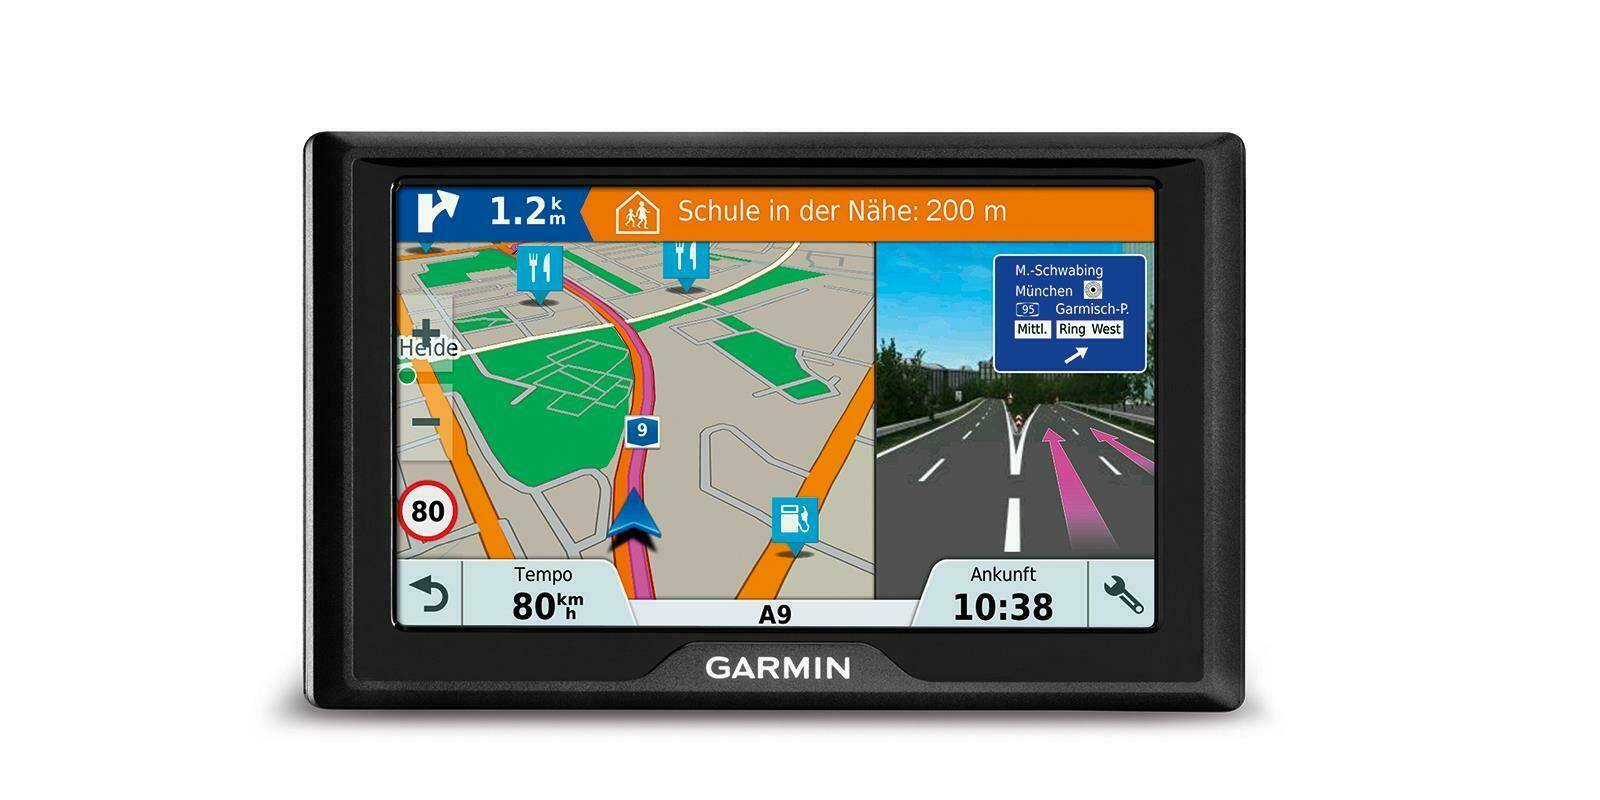 GARMIN Navigationsgerät Drive 5 Plus ganze 28% günstiger (Lidl)